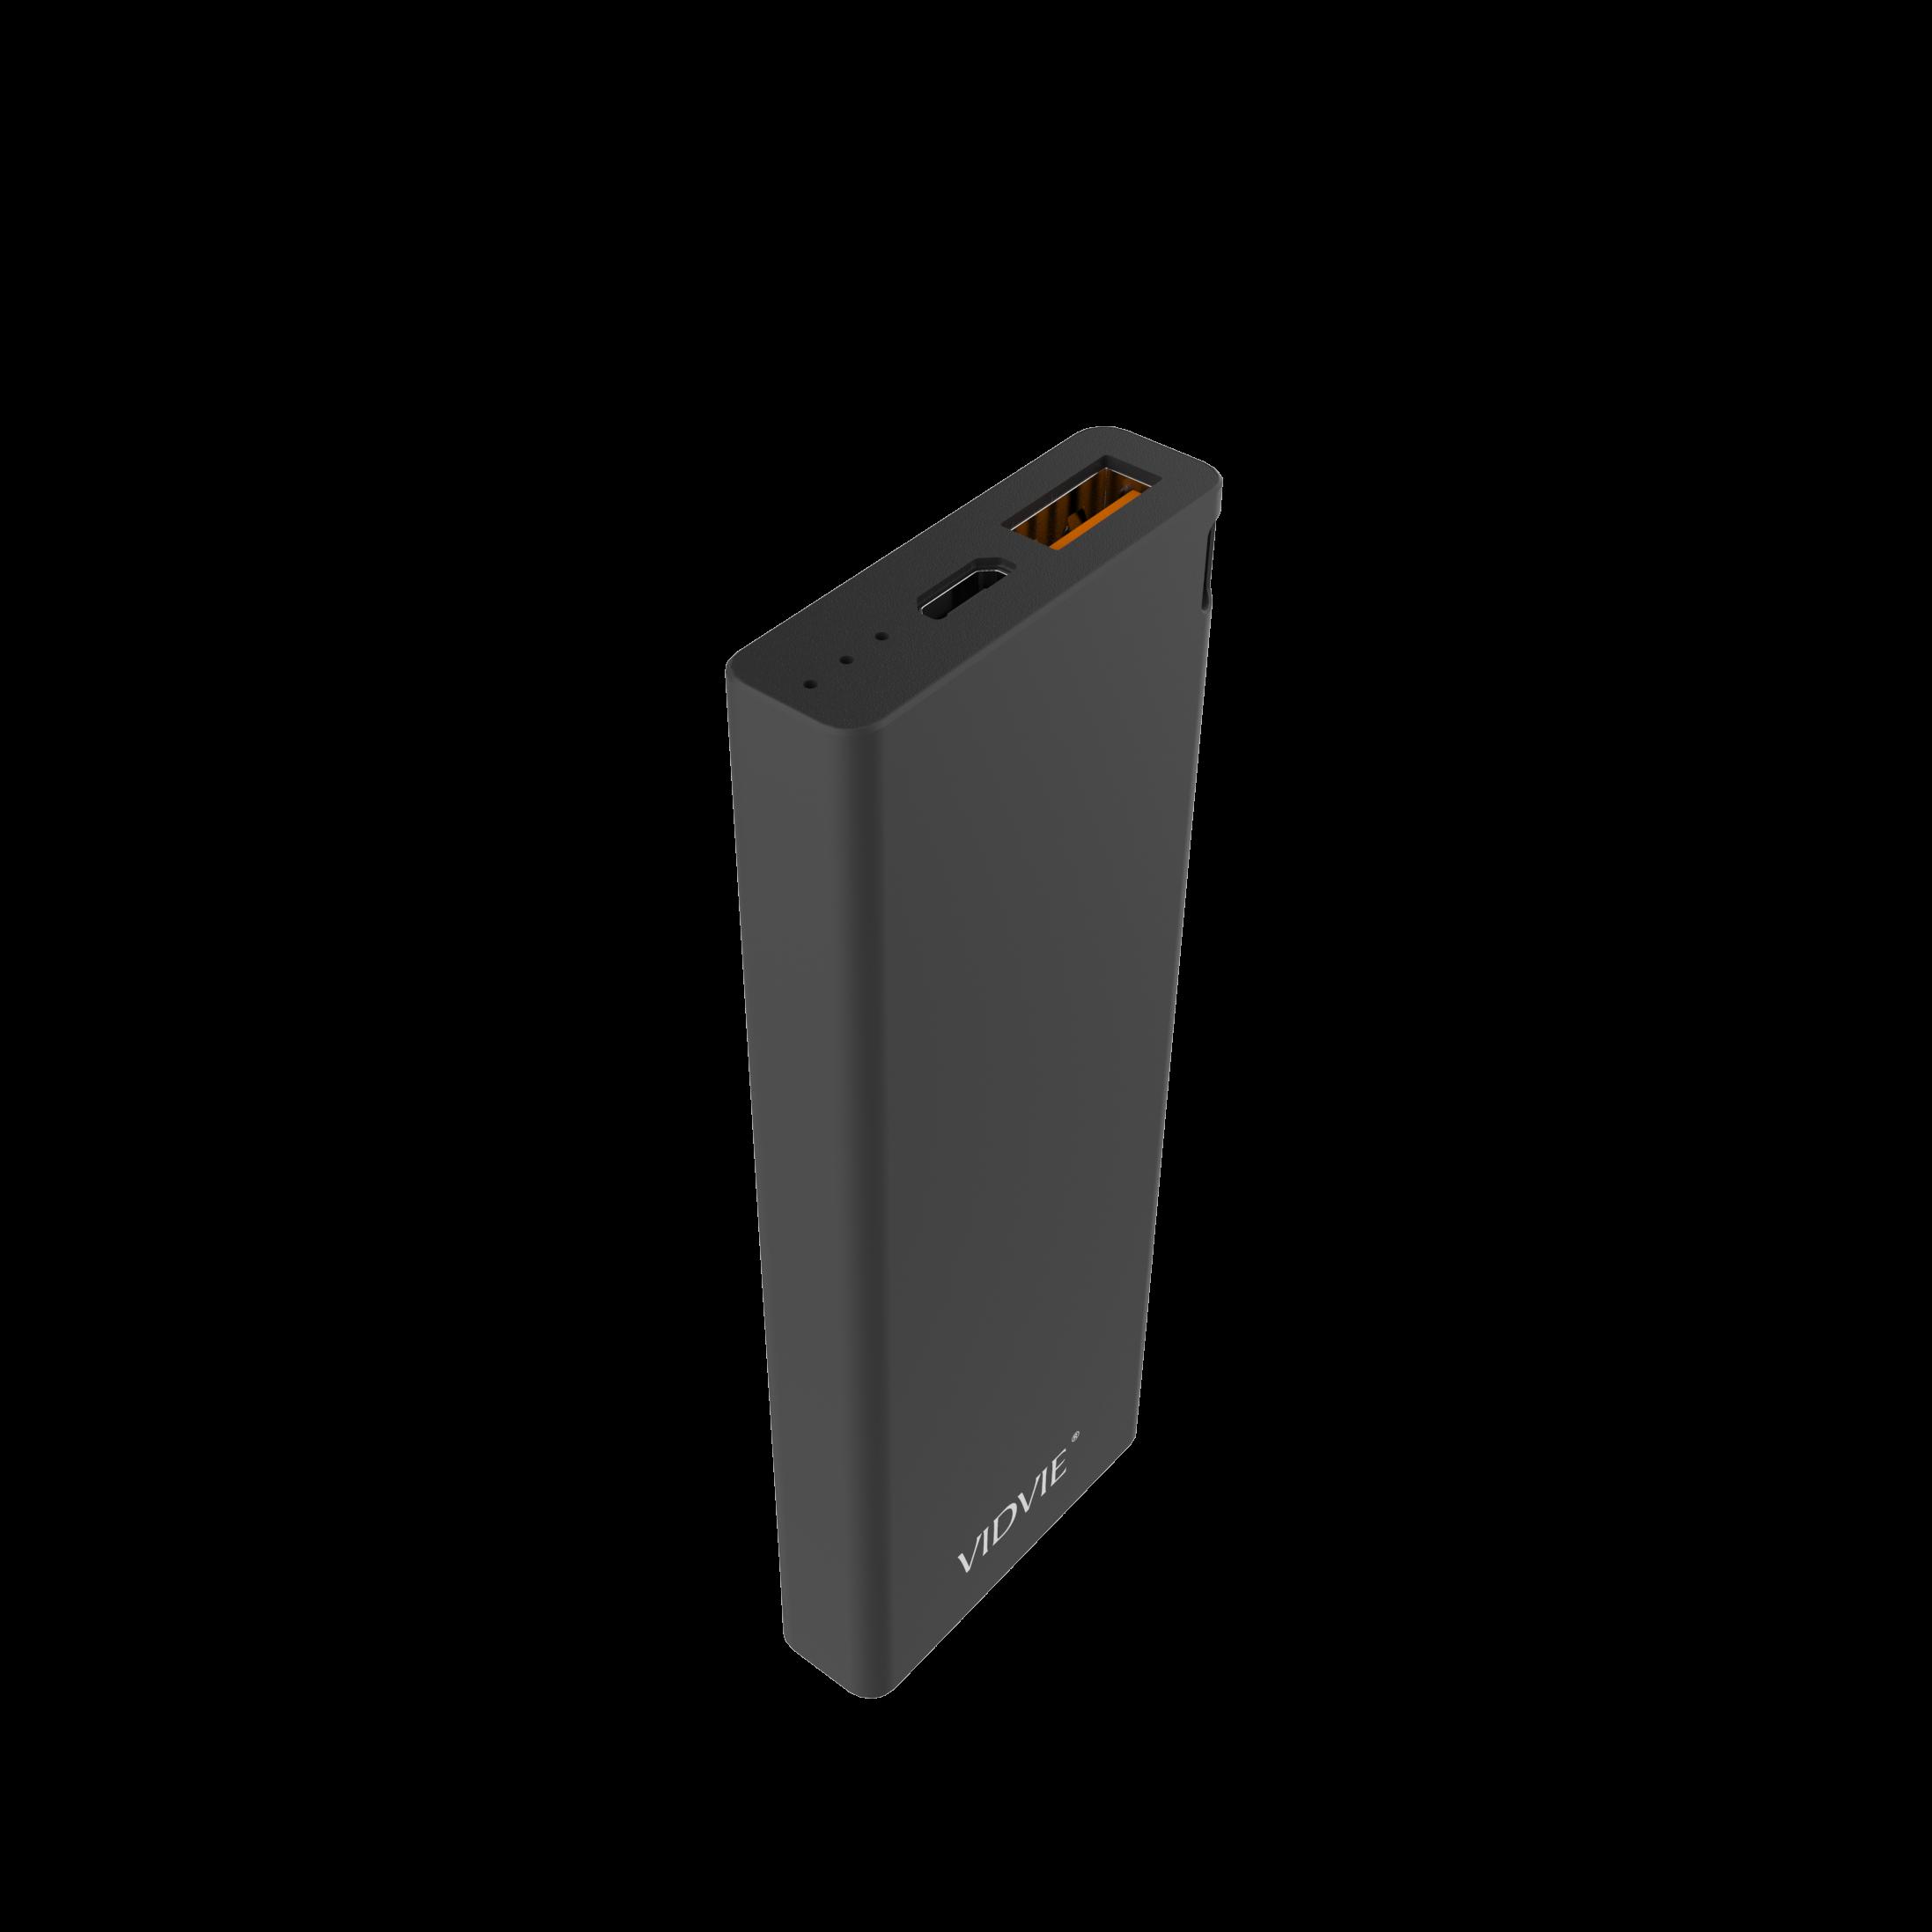 6000 mAh POWER BANK polymer core Shell VIDVIE - PB713 BLACK